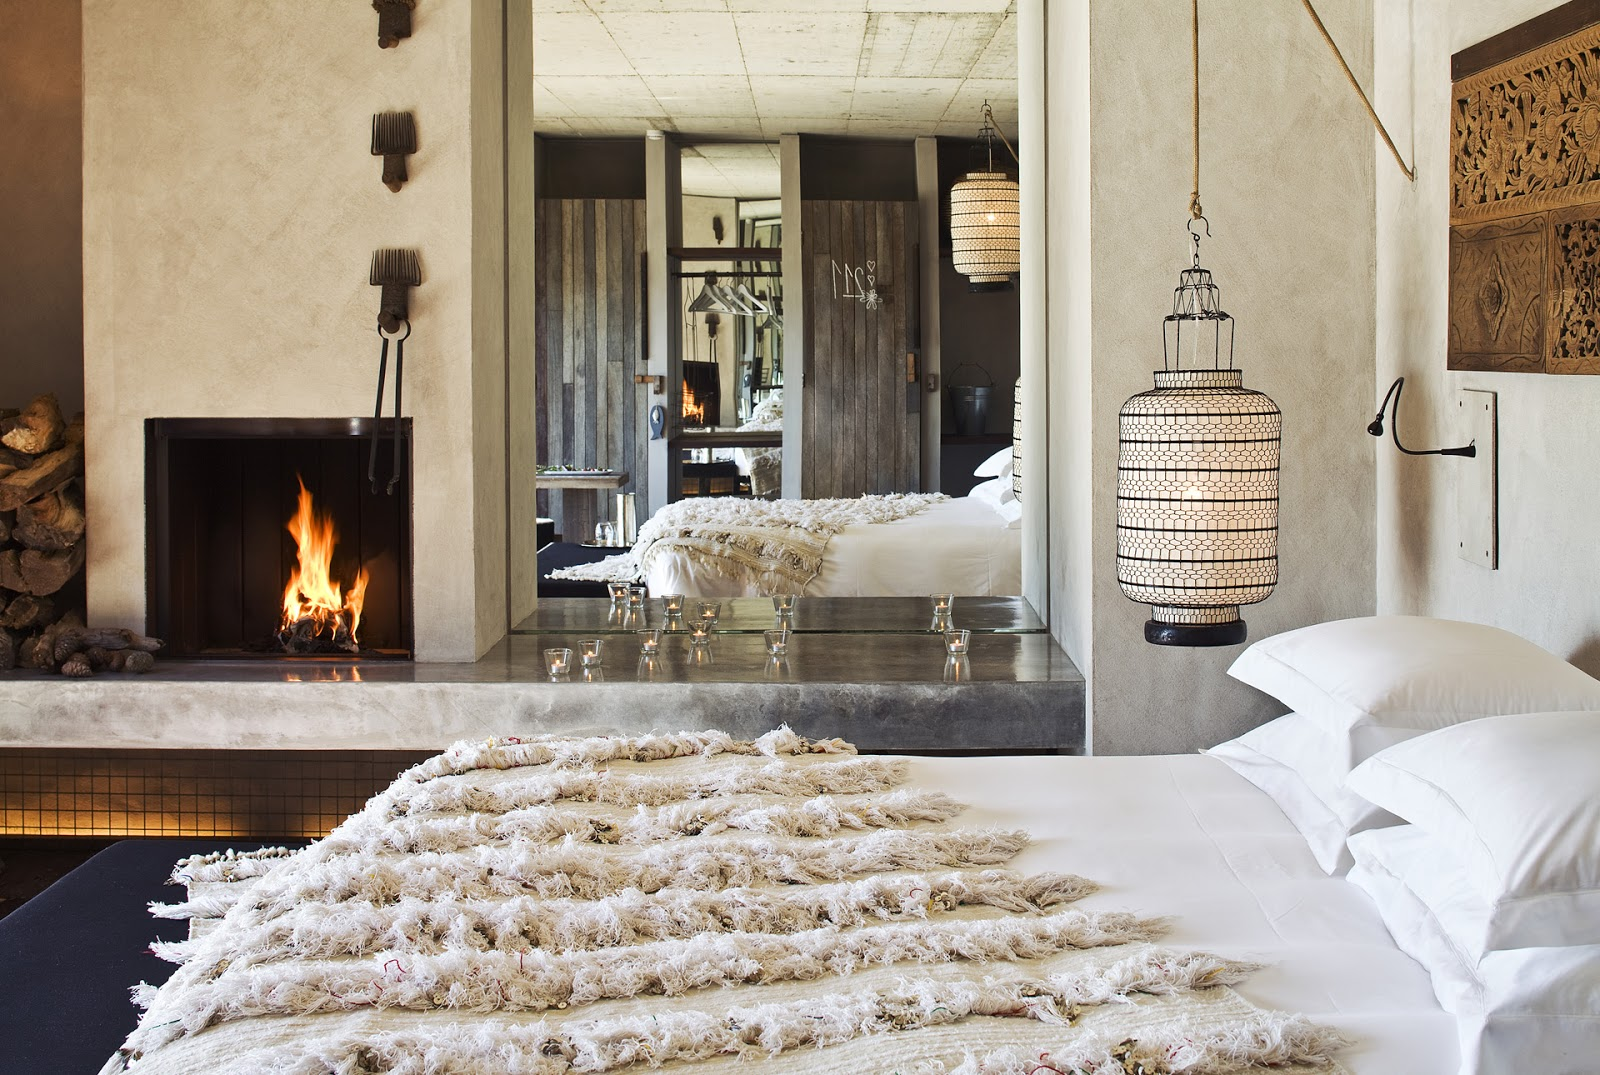 eco+style+holiday+luxury+areiasdoseixo+openspace+room+handira+candles+ethnicchic+cocomorocco